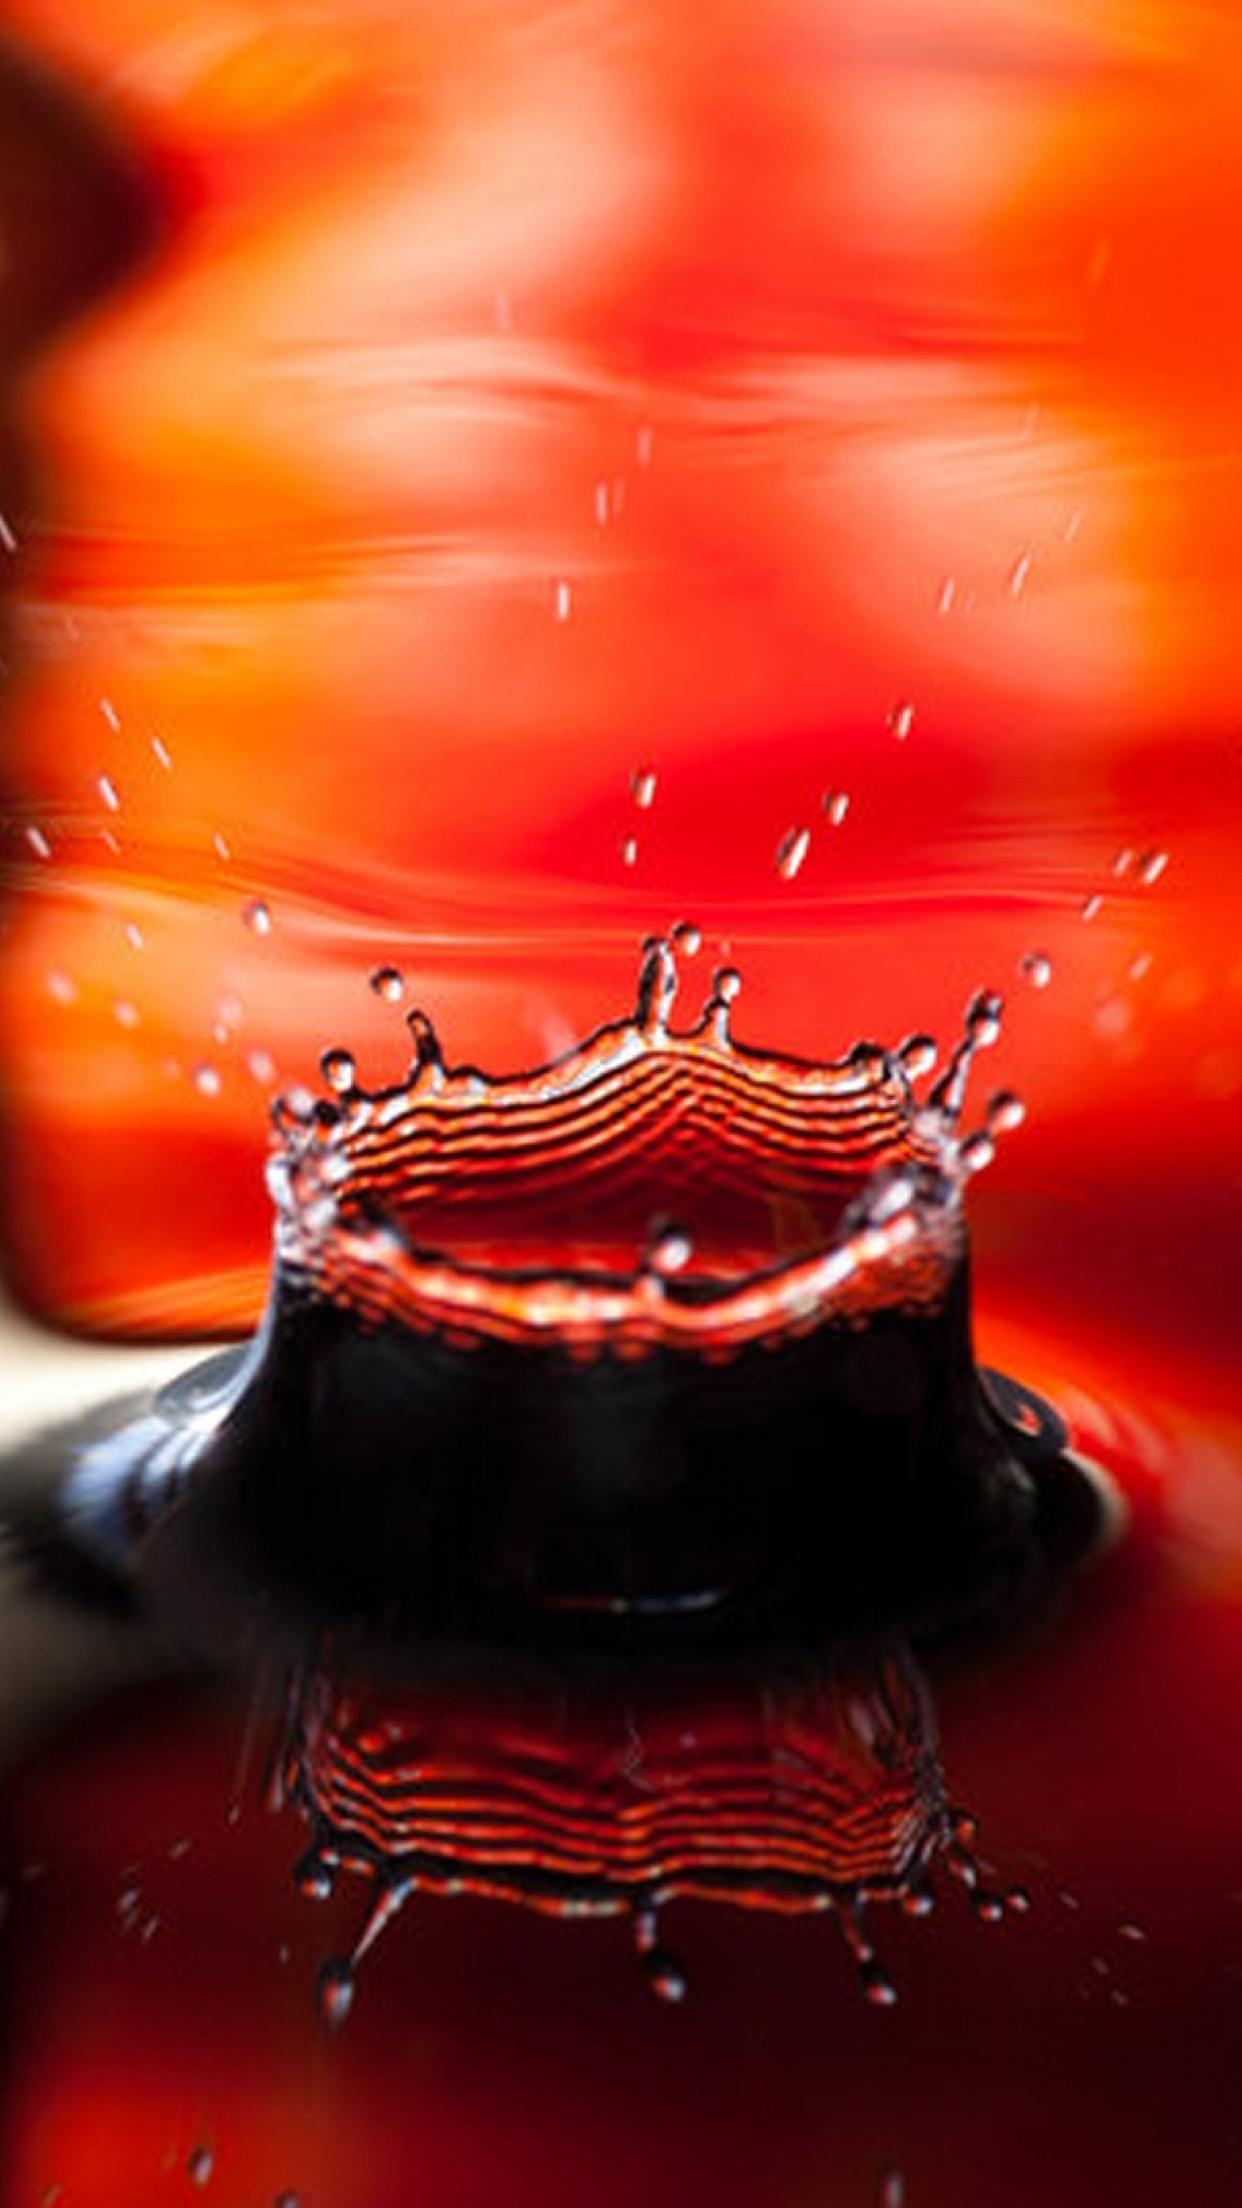 Liquid 3 3Wallpapers iPhone Parallax Liquid : 3